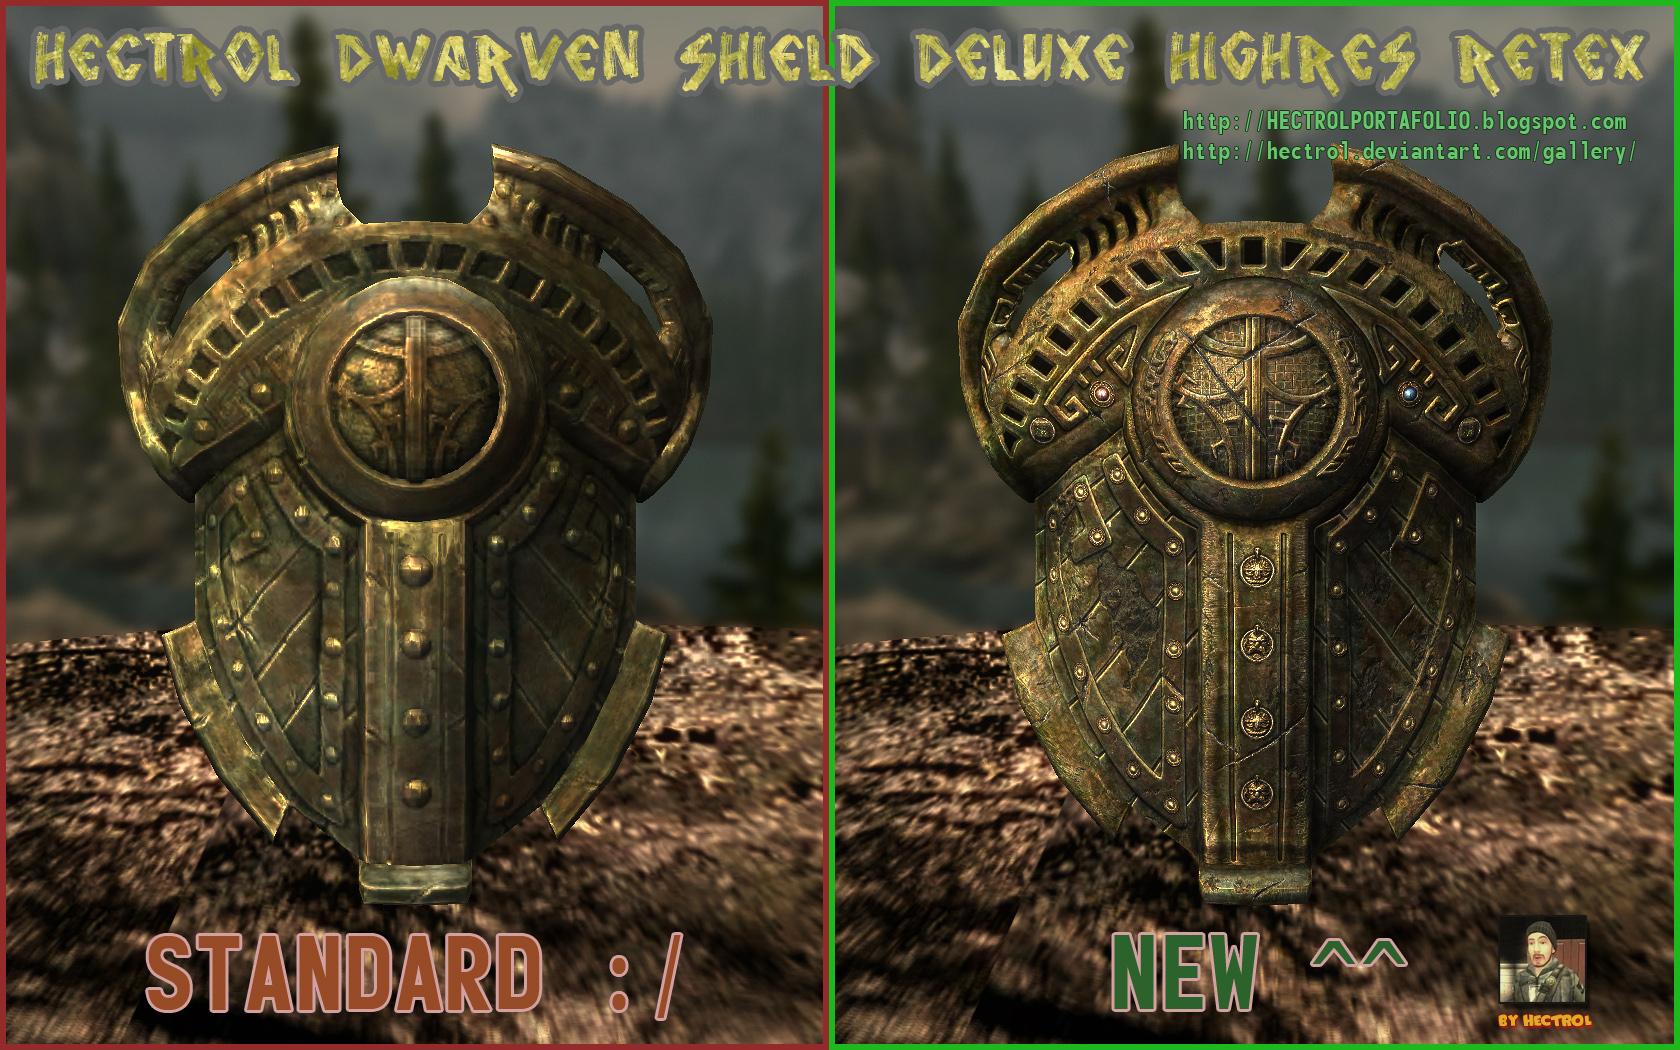 Hectrol DWARVEN SHIELD Deluxe HR Retex 03 by hectrol